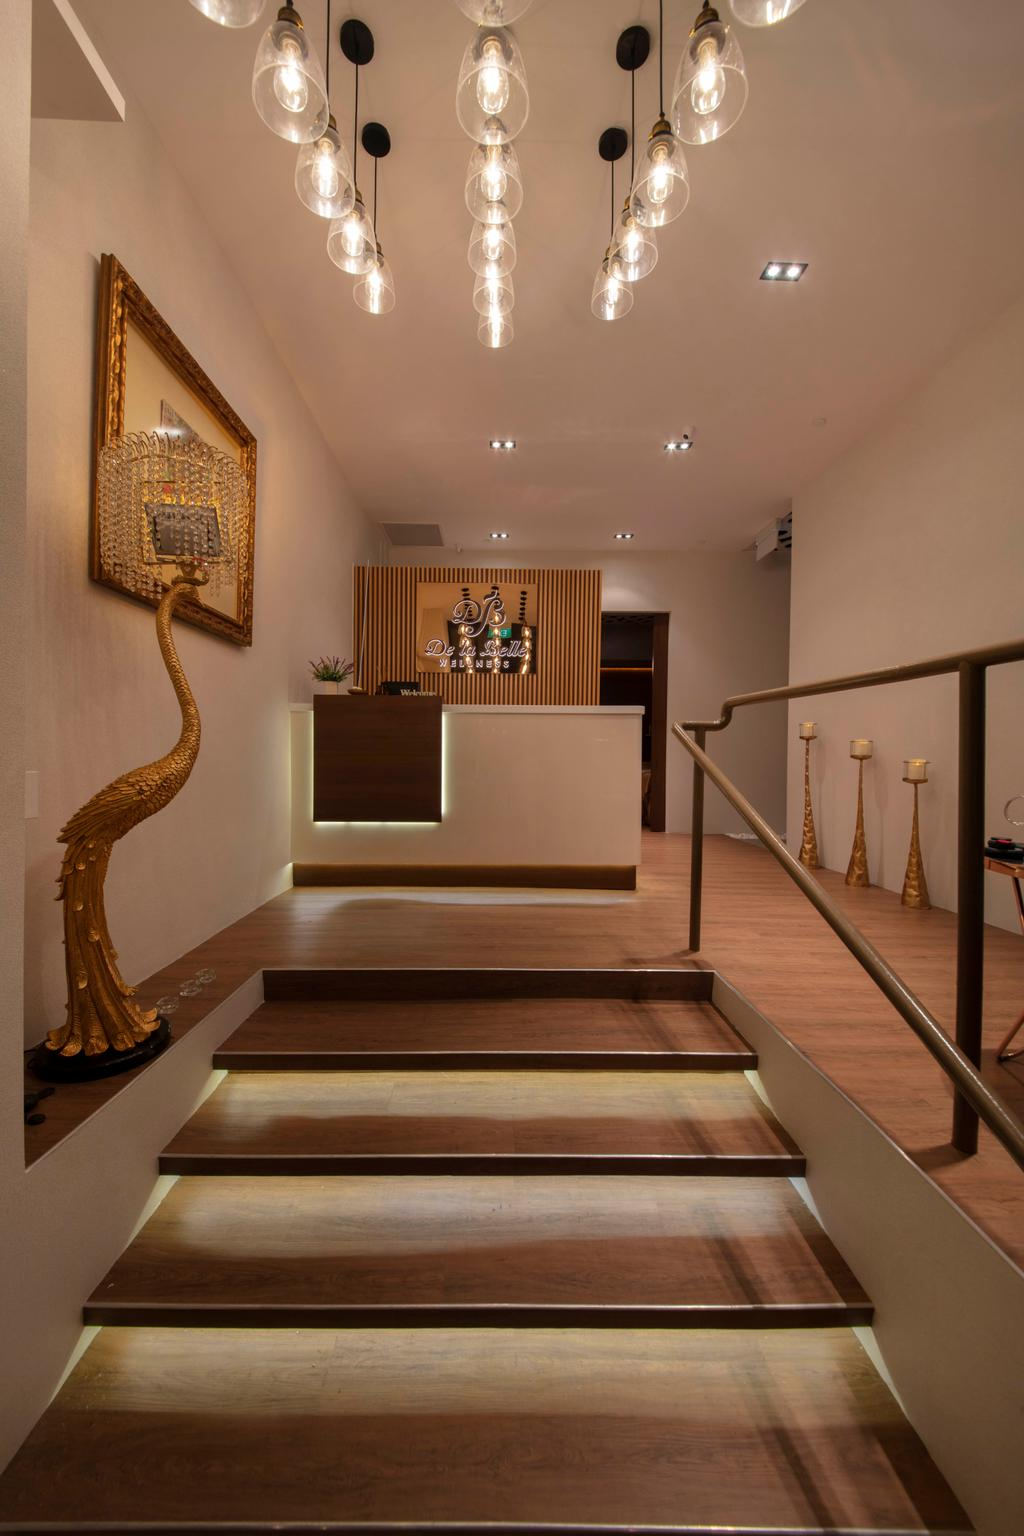 Wallich Street, Commercial, Interior Designer, Starry Homestead, Contemporary